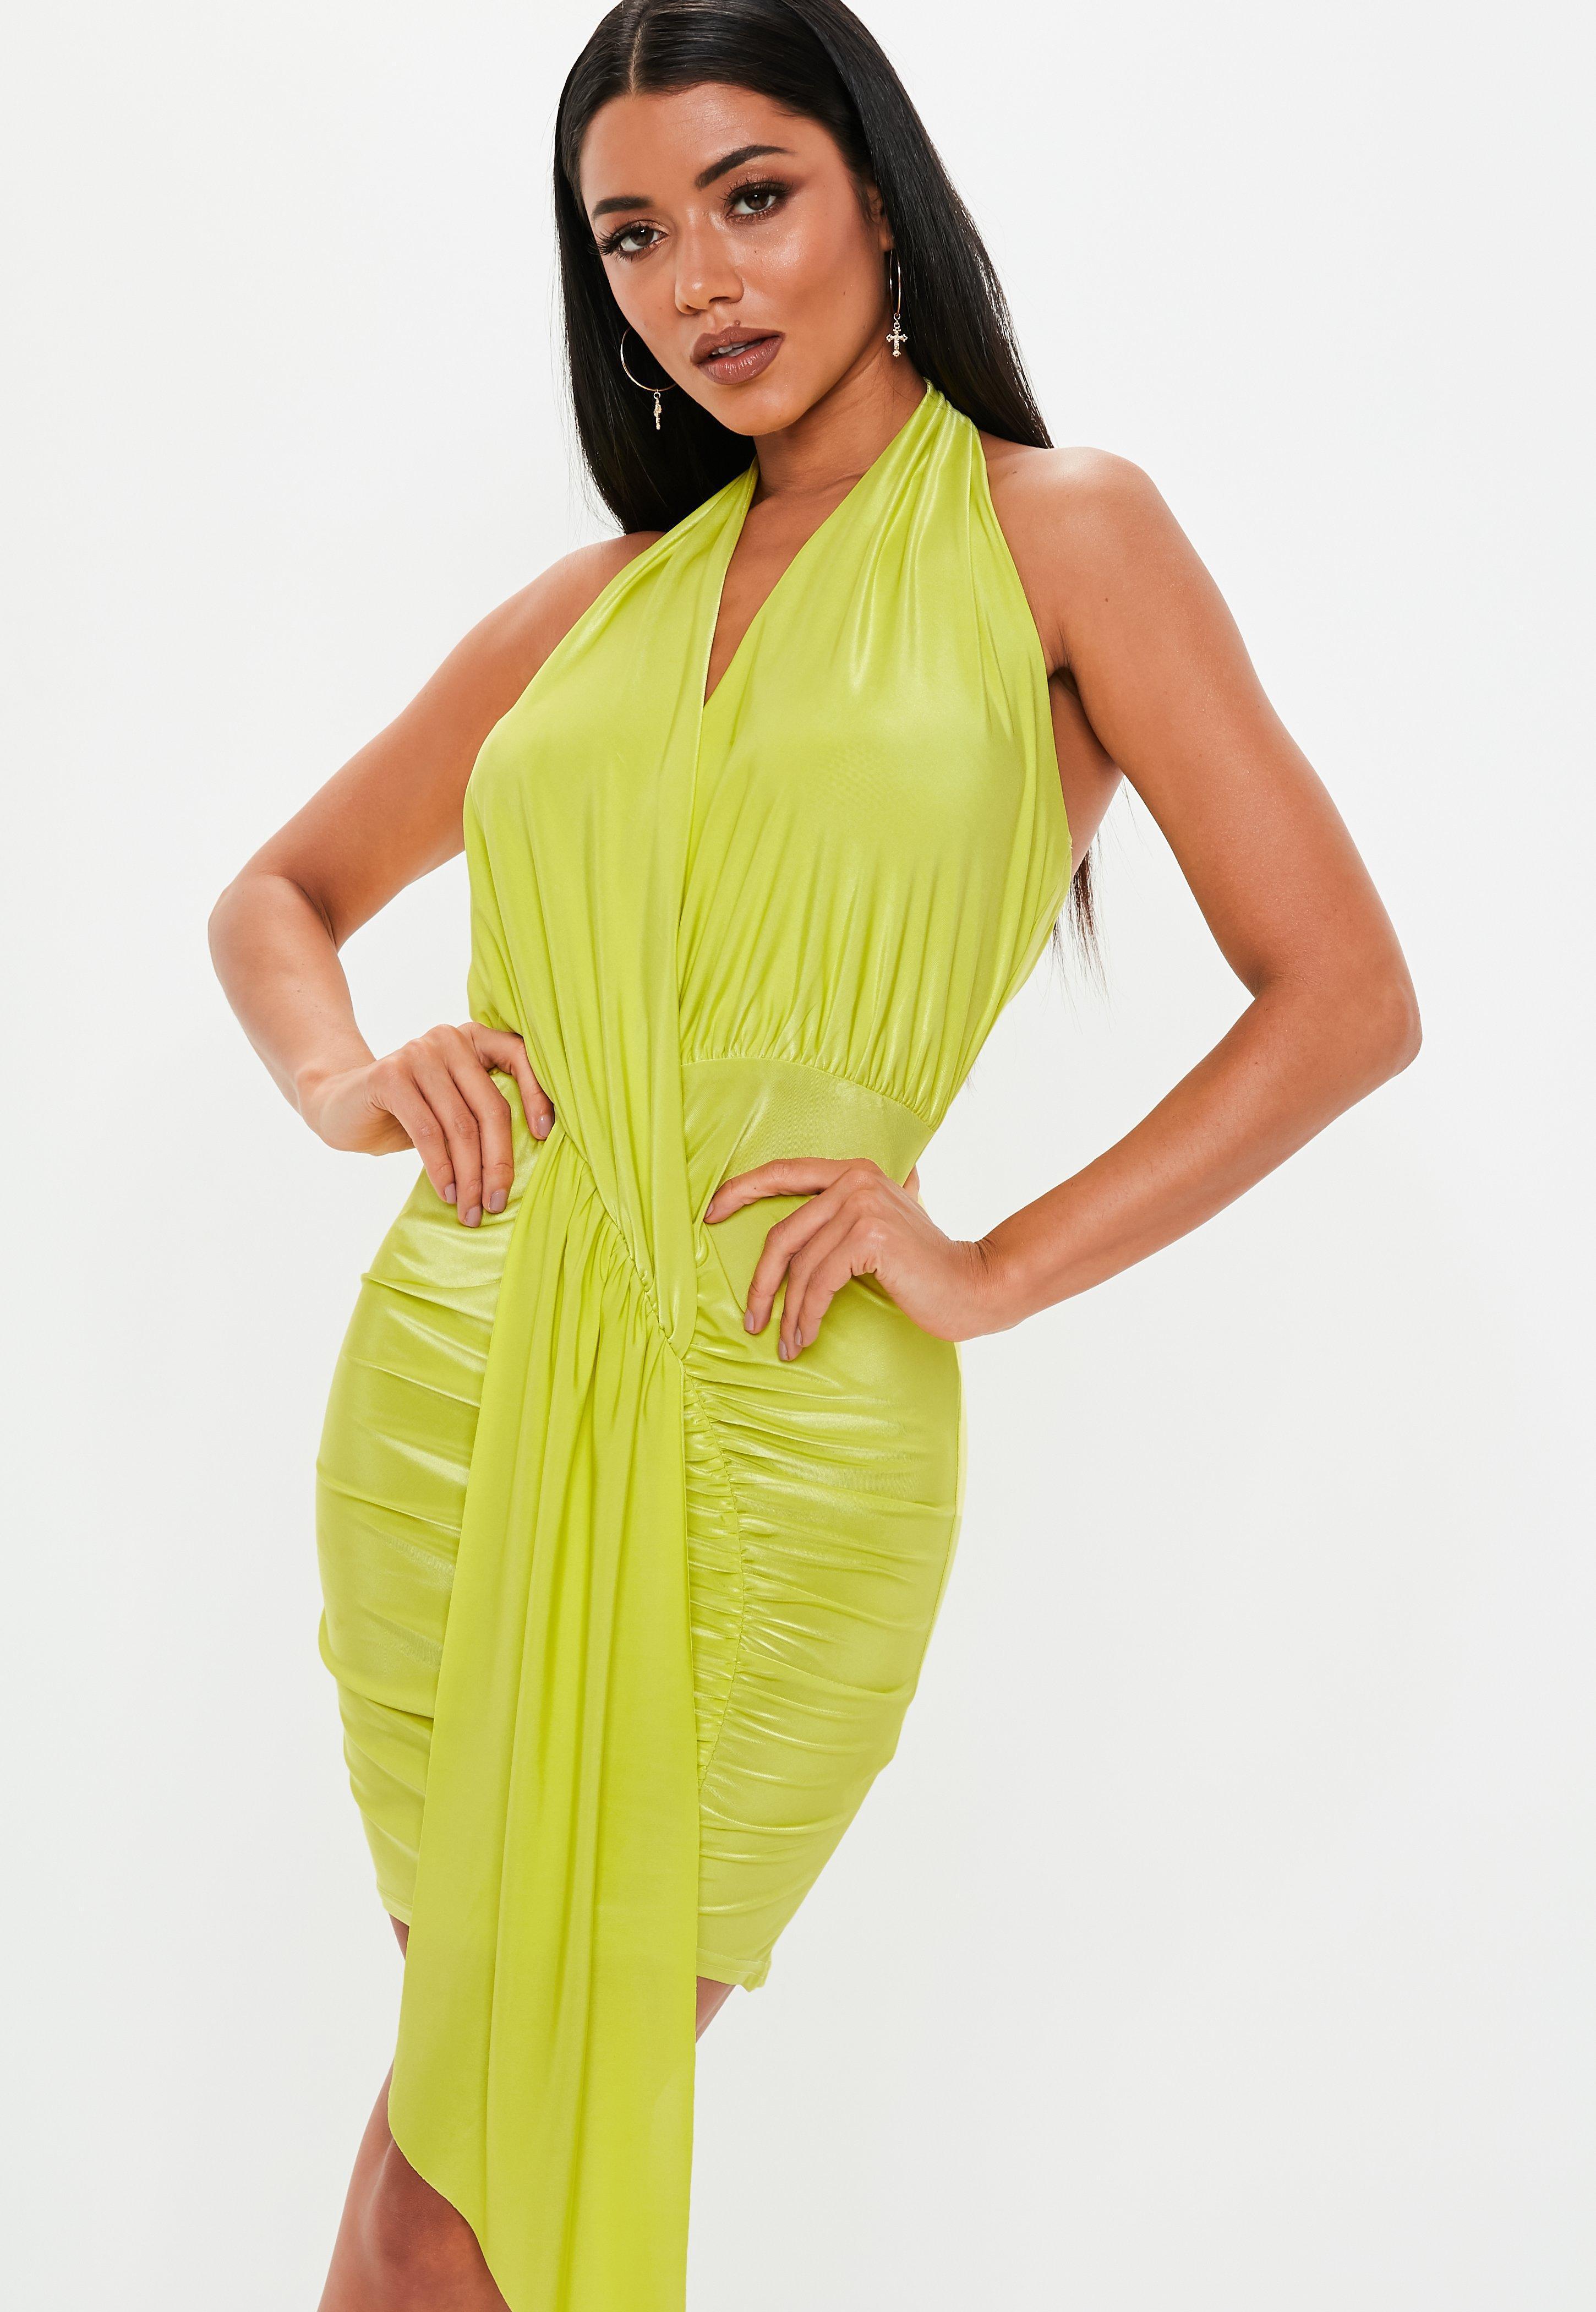 Lyst - Missguided Lime Green Slinky Cowl Drape Mini Dress in Green 4b6620f3c